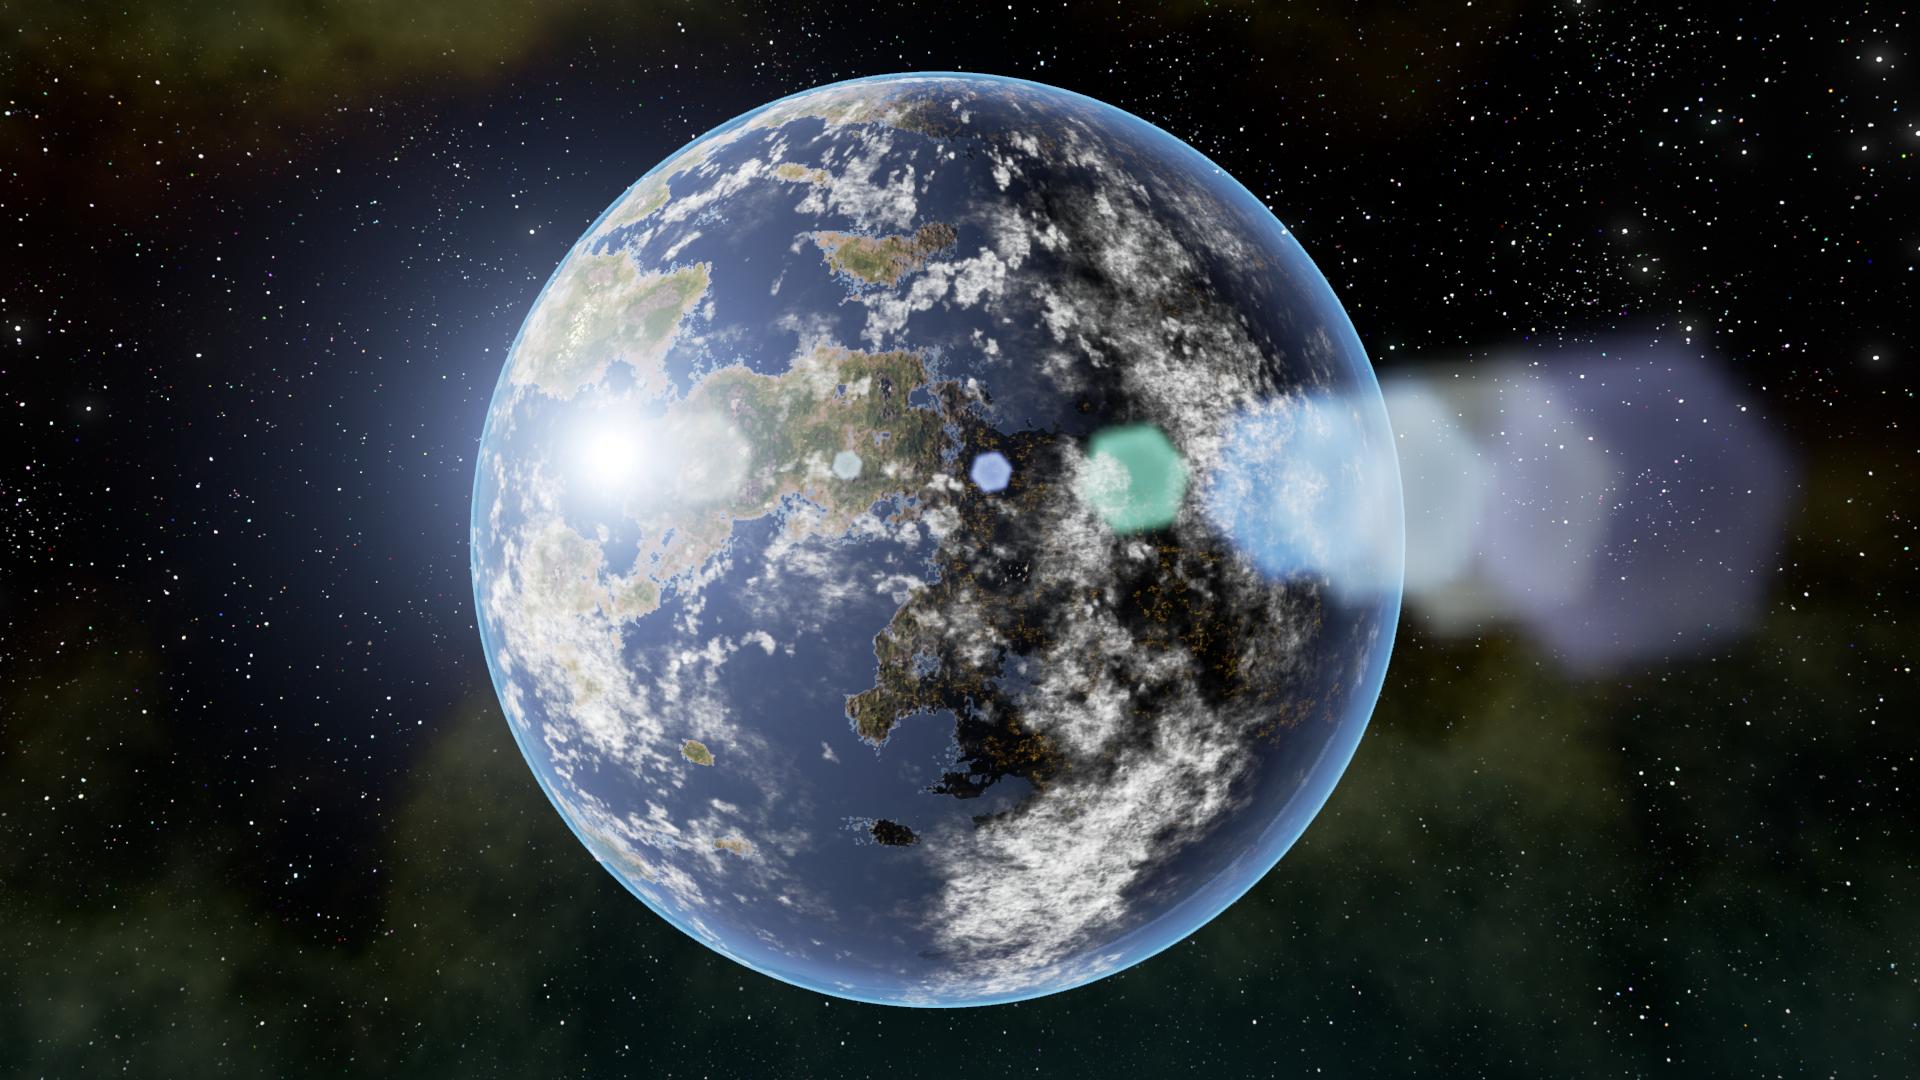 Planetarium planet blueprint by maxstudios in blueprints ue4 planetarium planet blueprint by maxstudios in blueprints ue4 marketplace malvernweather Images